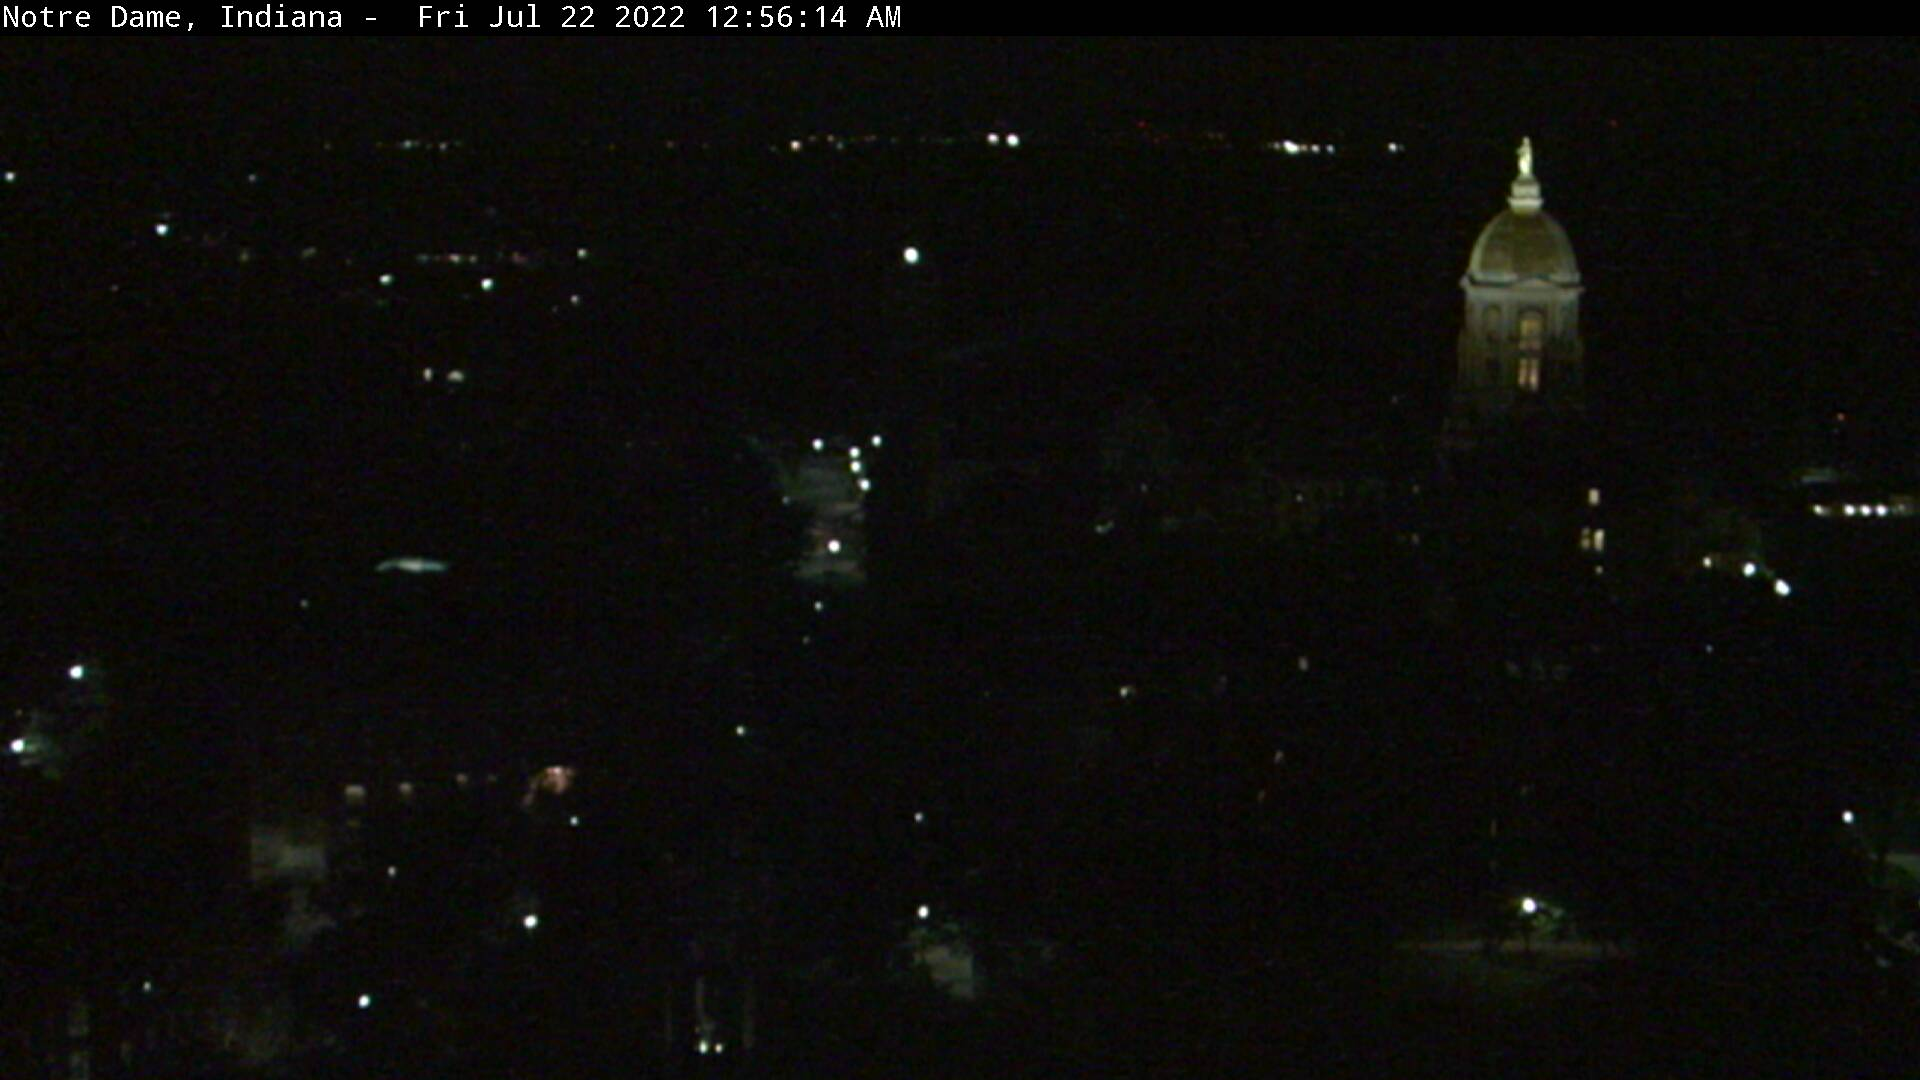 Notre Dame, Indiana Sat. 00:56